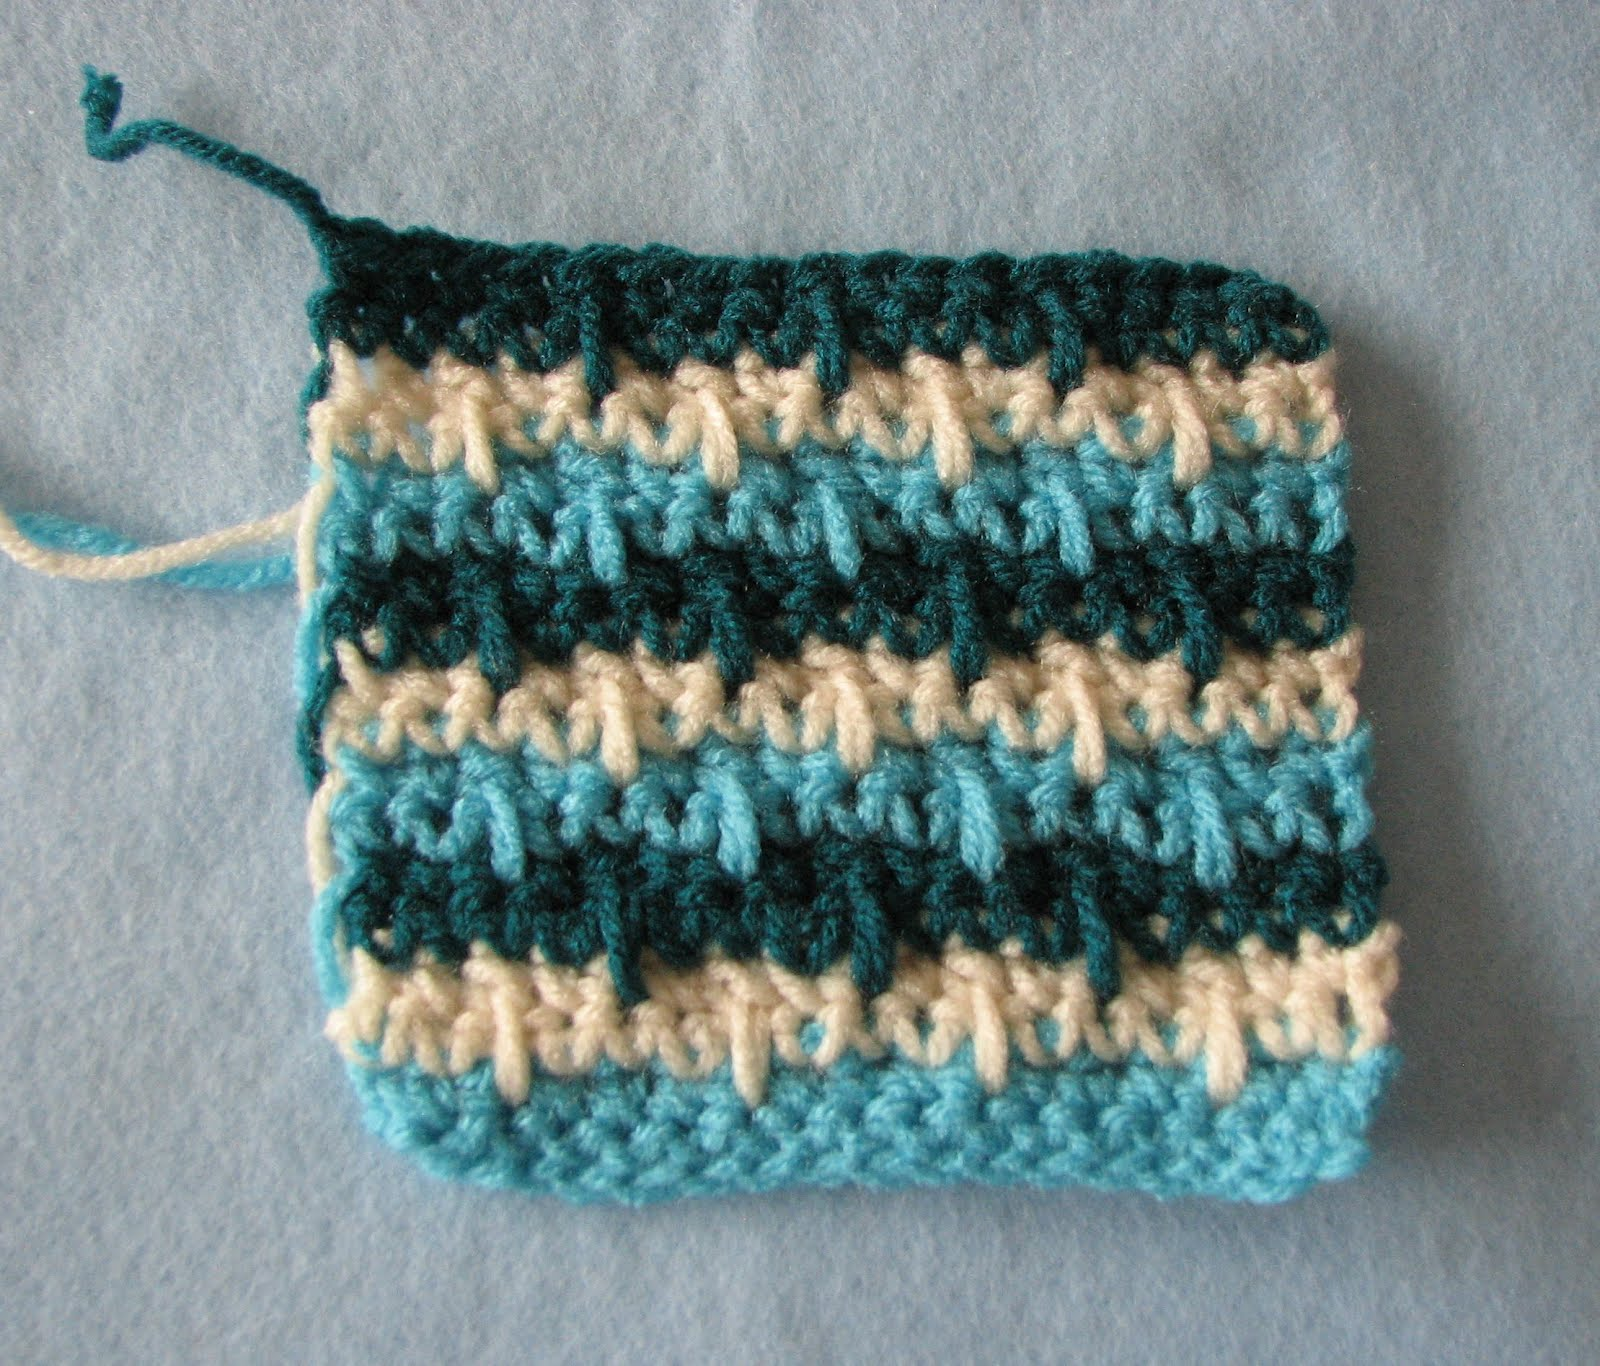 Donna s crochet designs blog of free patterns 2012 04 08